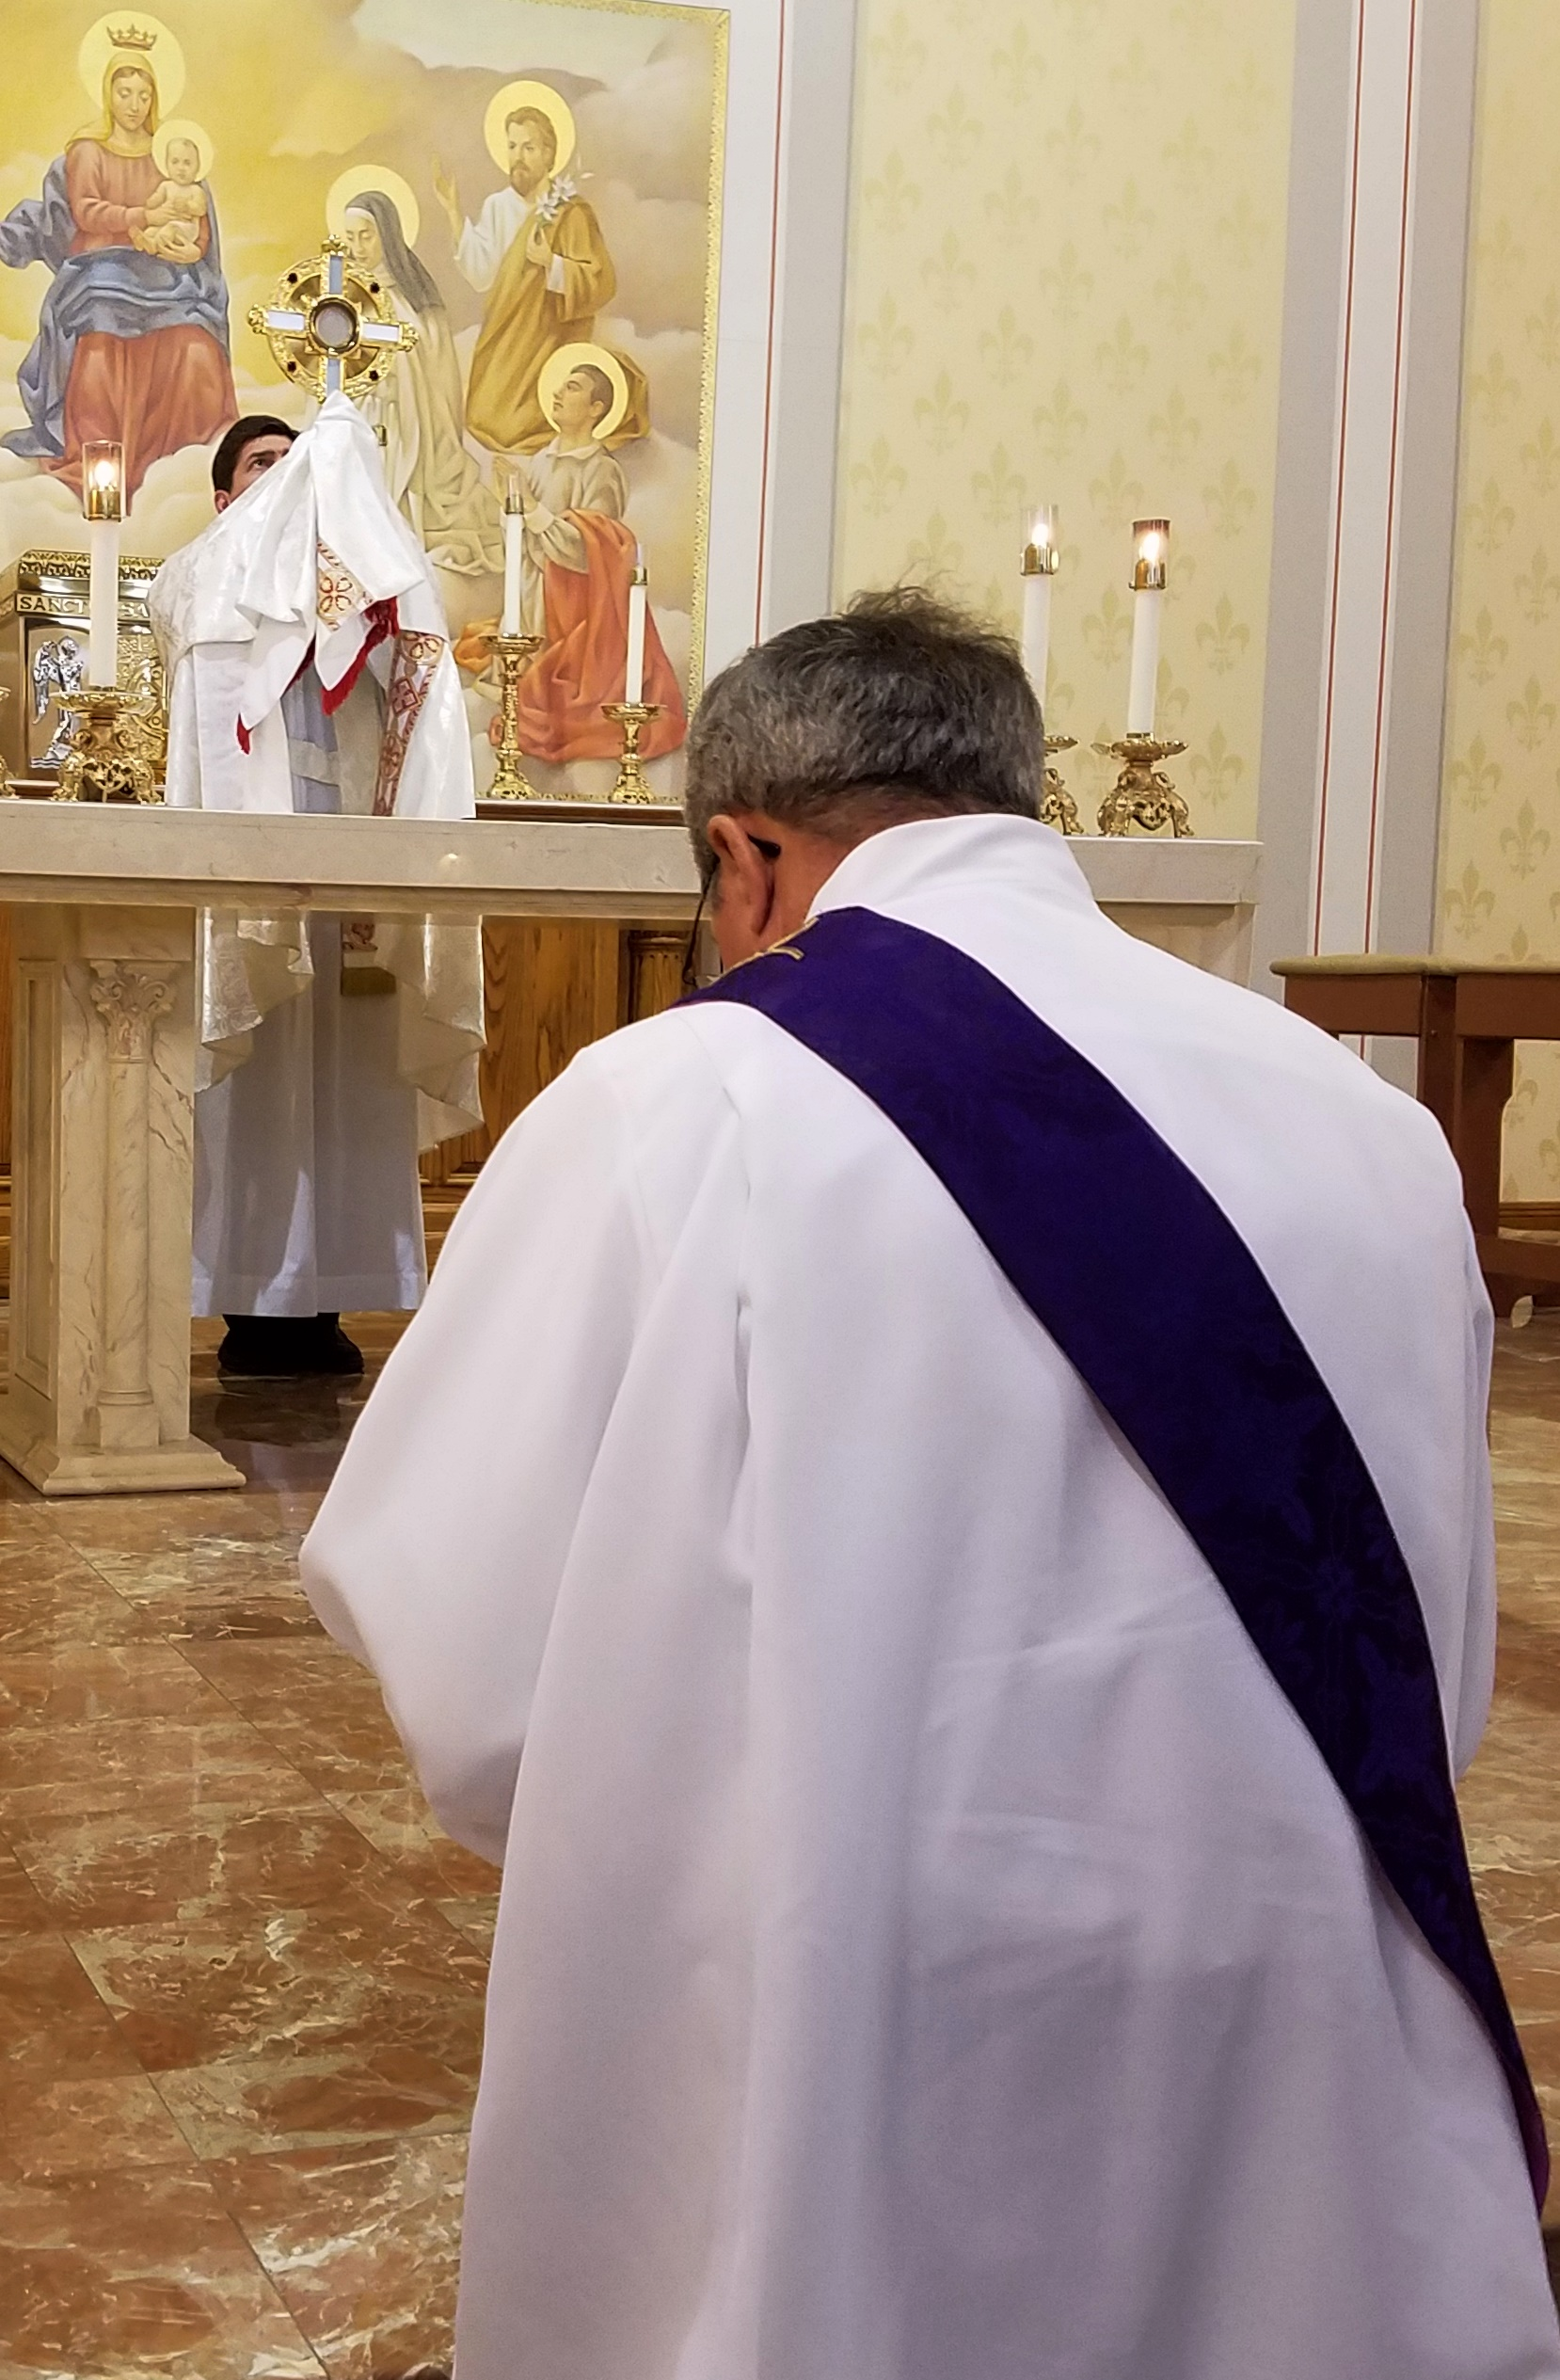 ville platte catholic single men Nonprofit & 501c organizations ville platte, la  men and women of integrity  sacred heart of jesus roman catholic church: 708.